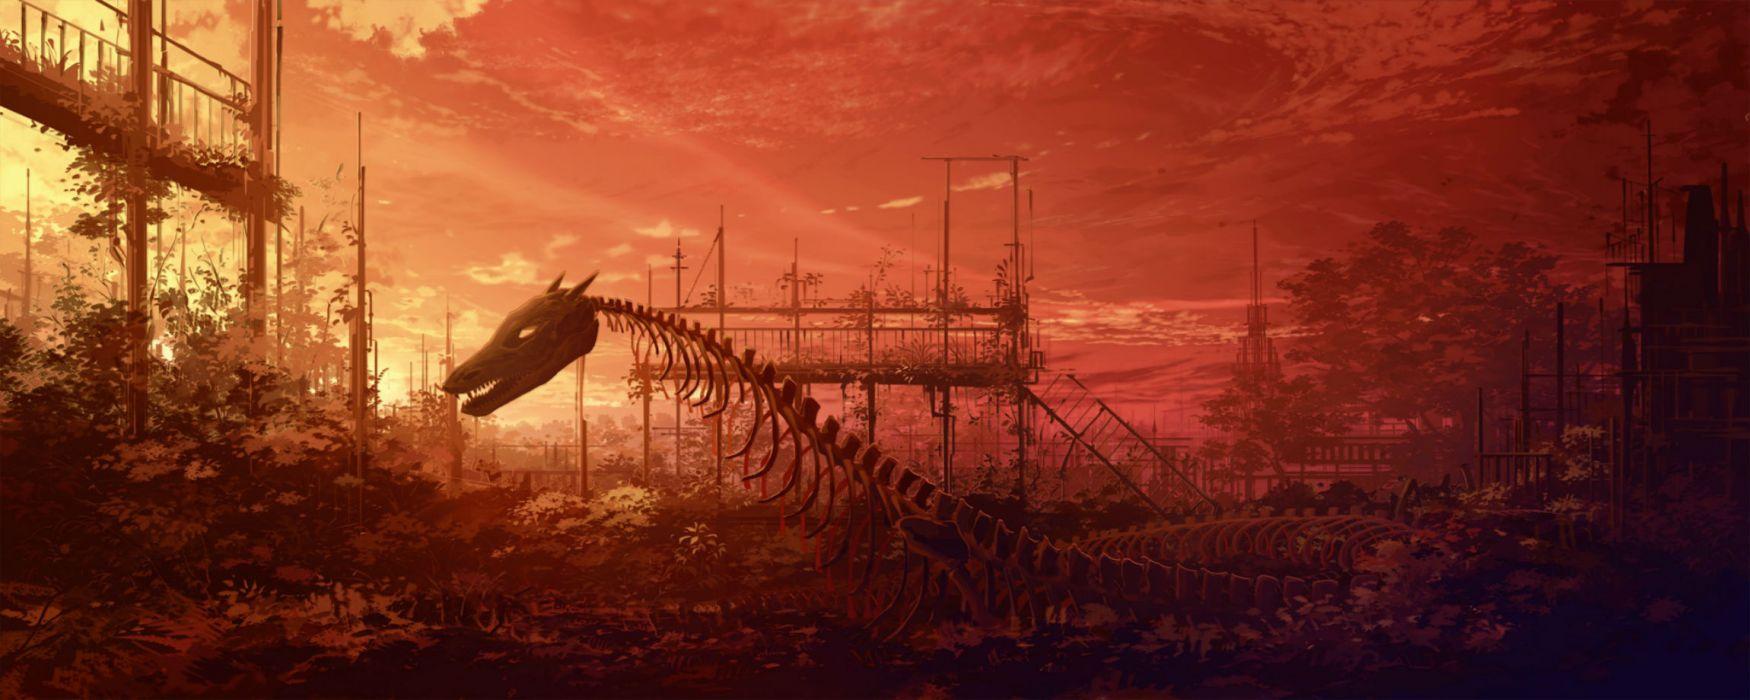 landscape monochrome scenic fantasy dragon dragons skeleton skeletons wallpaper